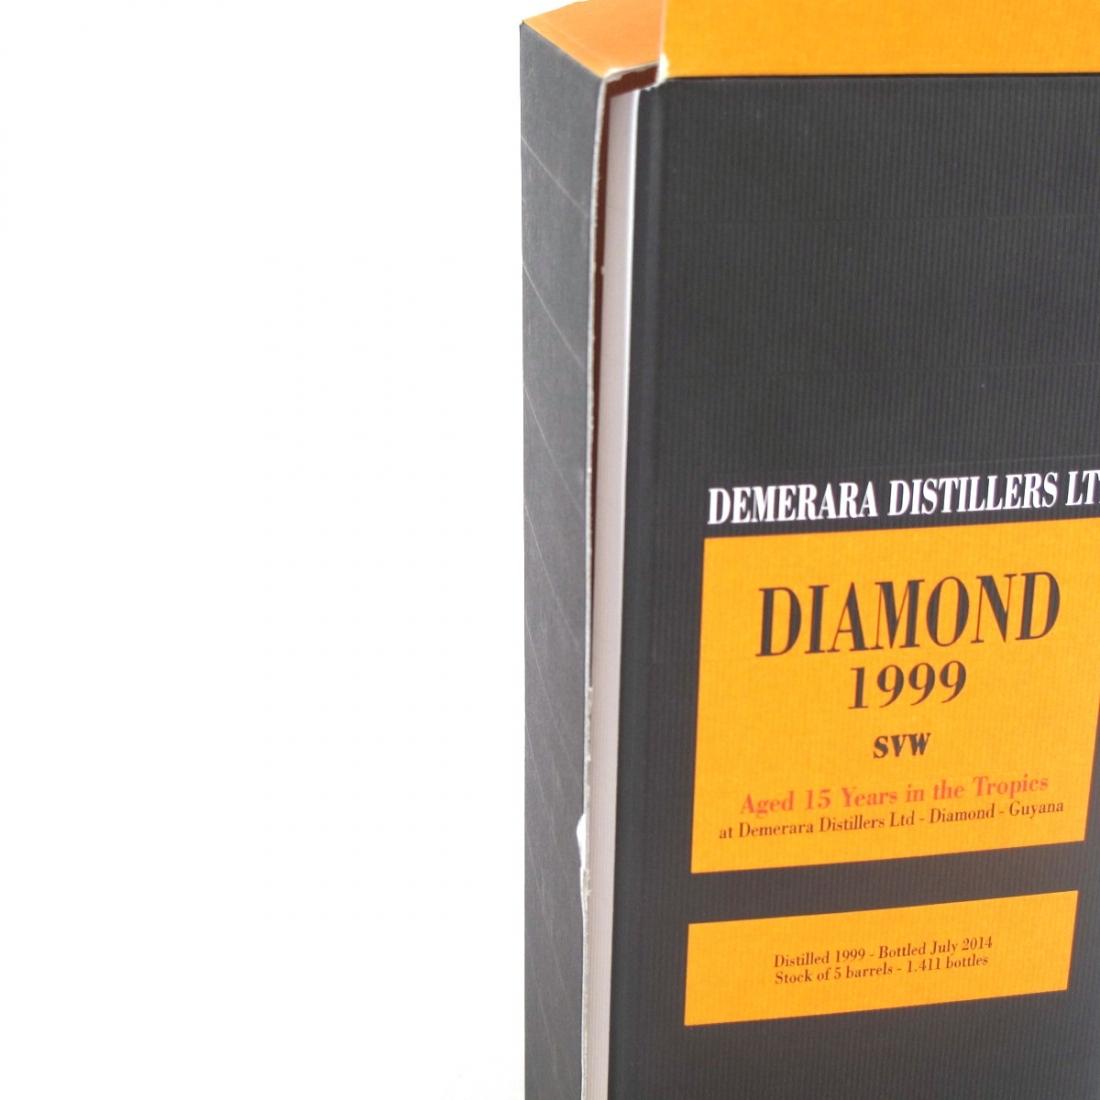 Diamond 1999 Demerara Distillers 15 Year Old Rum